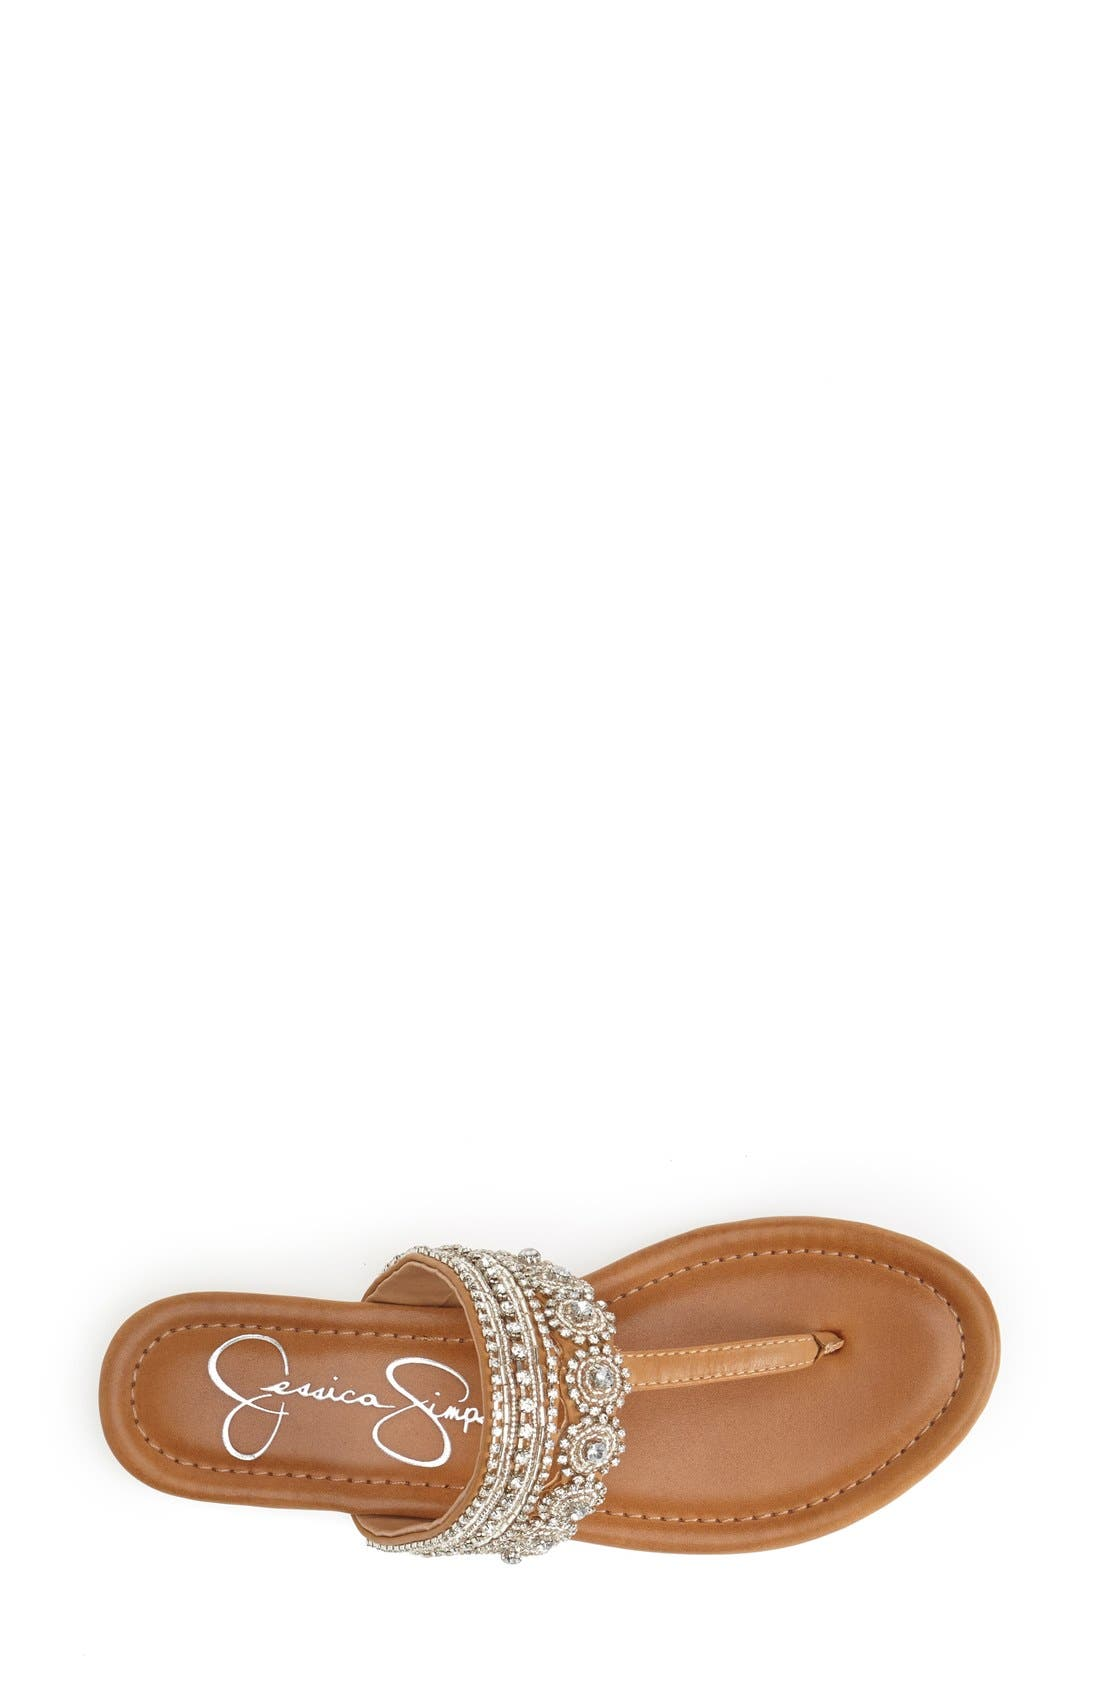 Alternate Image 3  - Jessica Simpson 'Roelle' Embellished Sandal (Women)